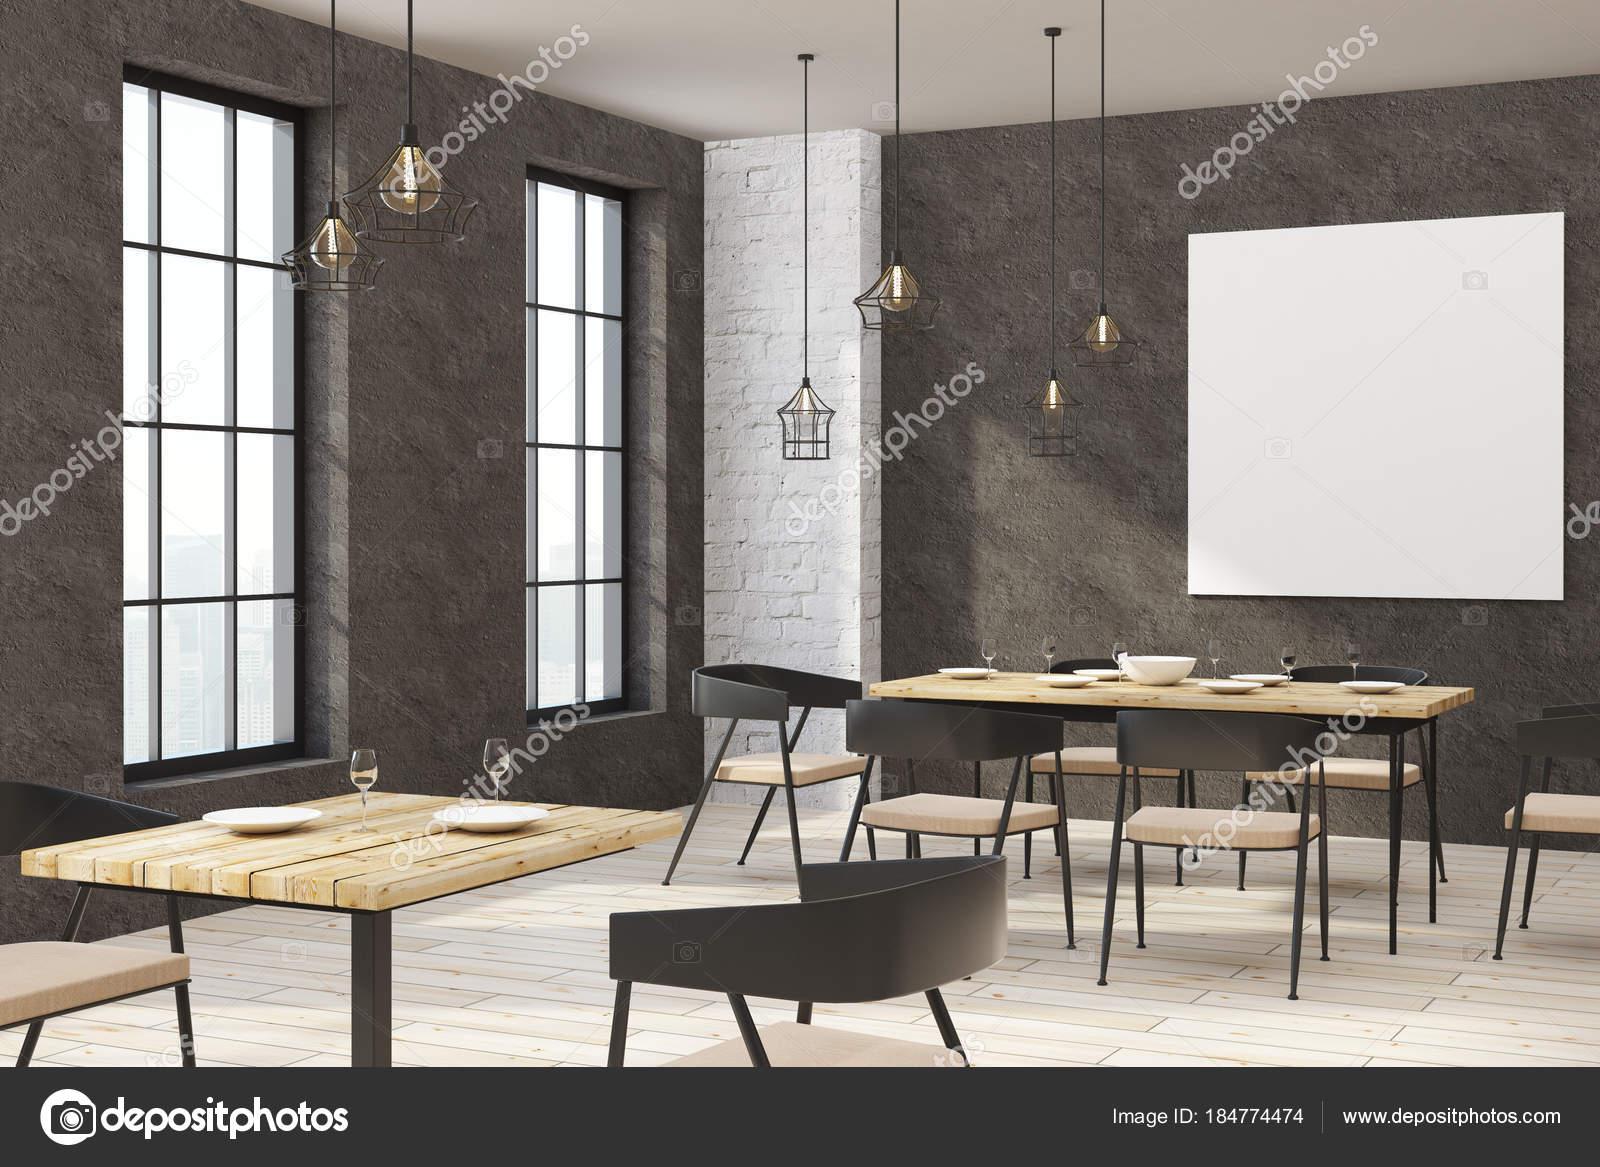 Modernes restaurant mit leeren poster u stockfoto peshkova